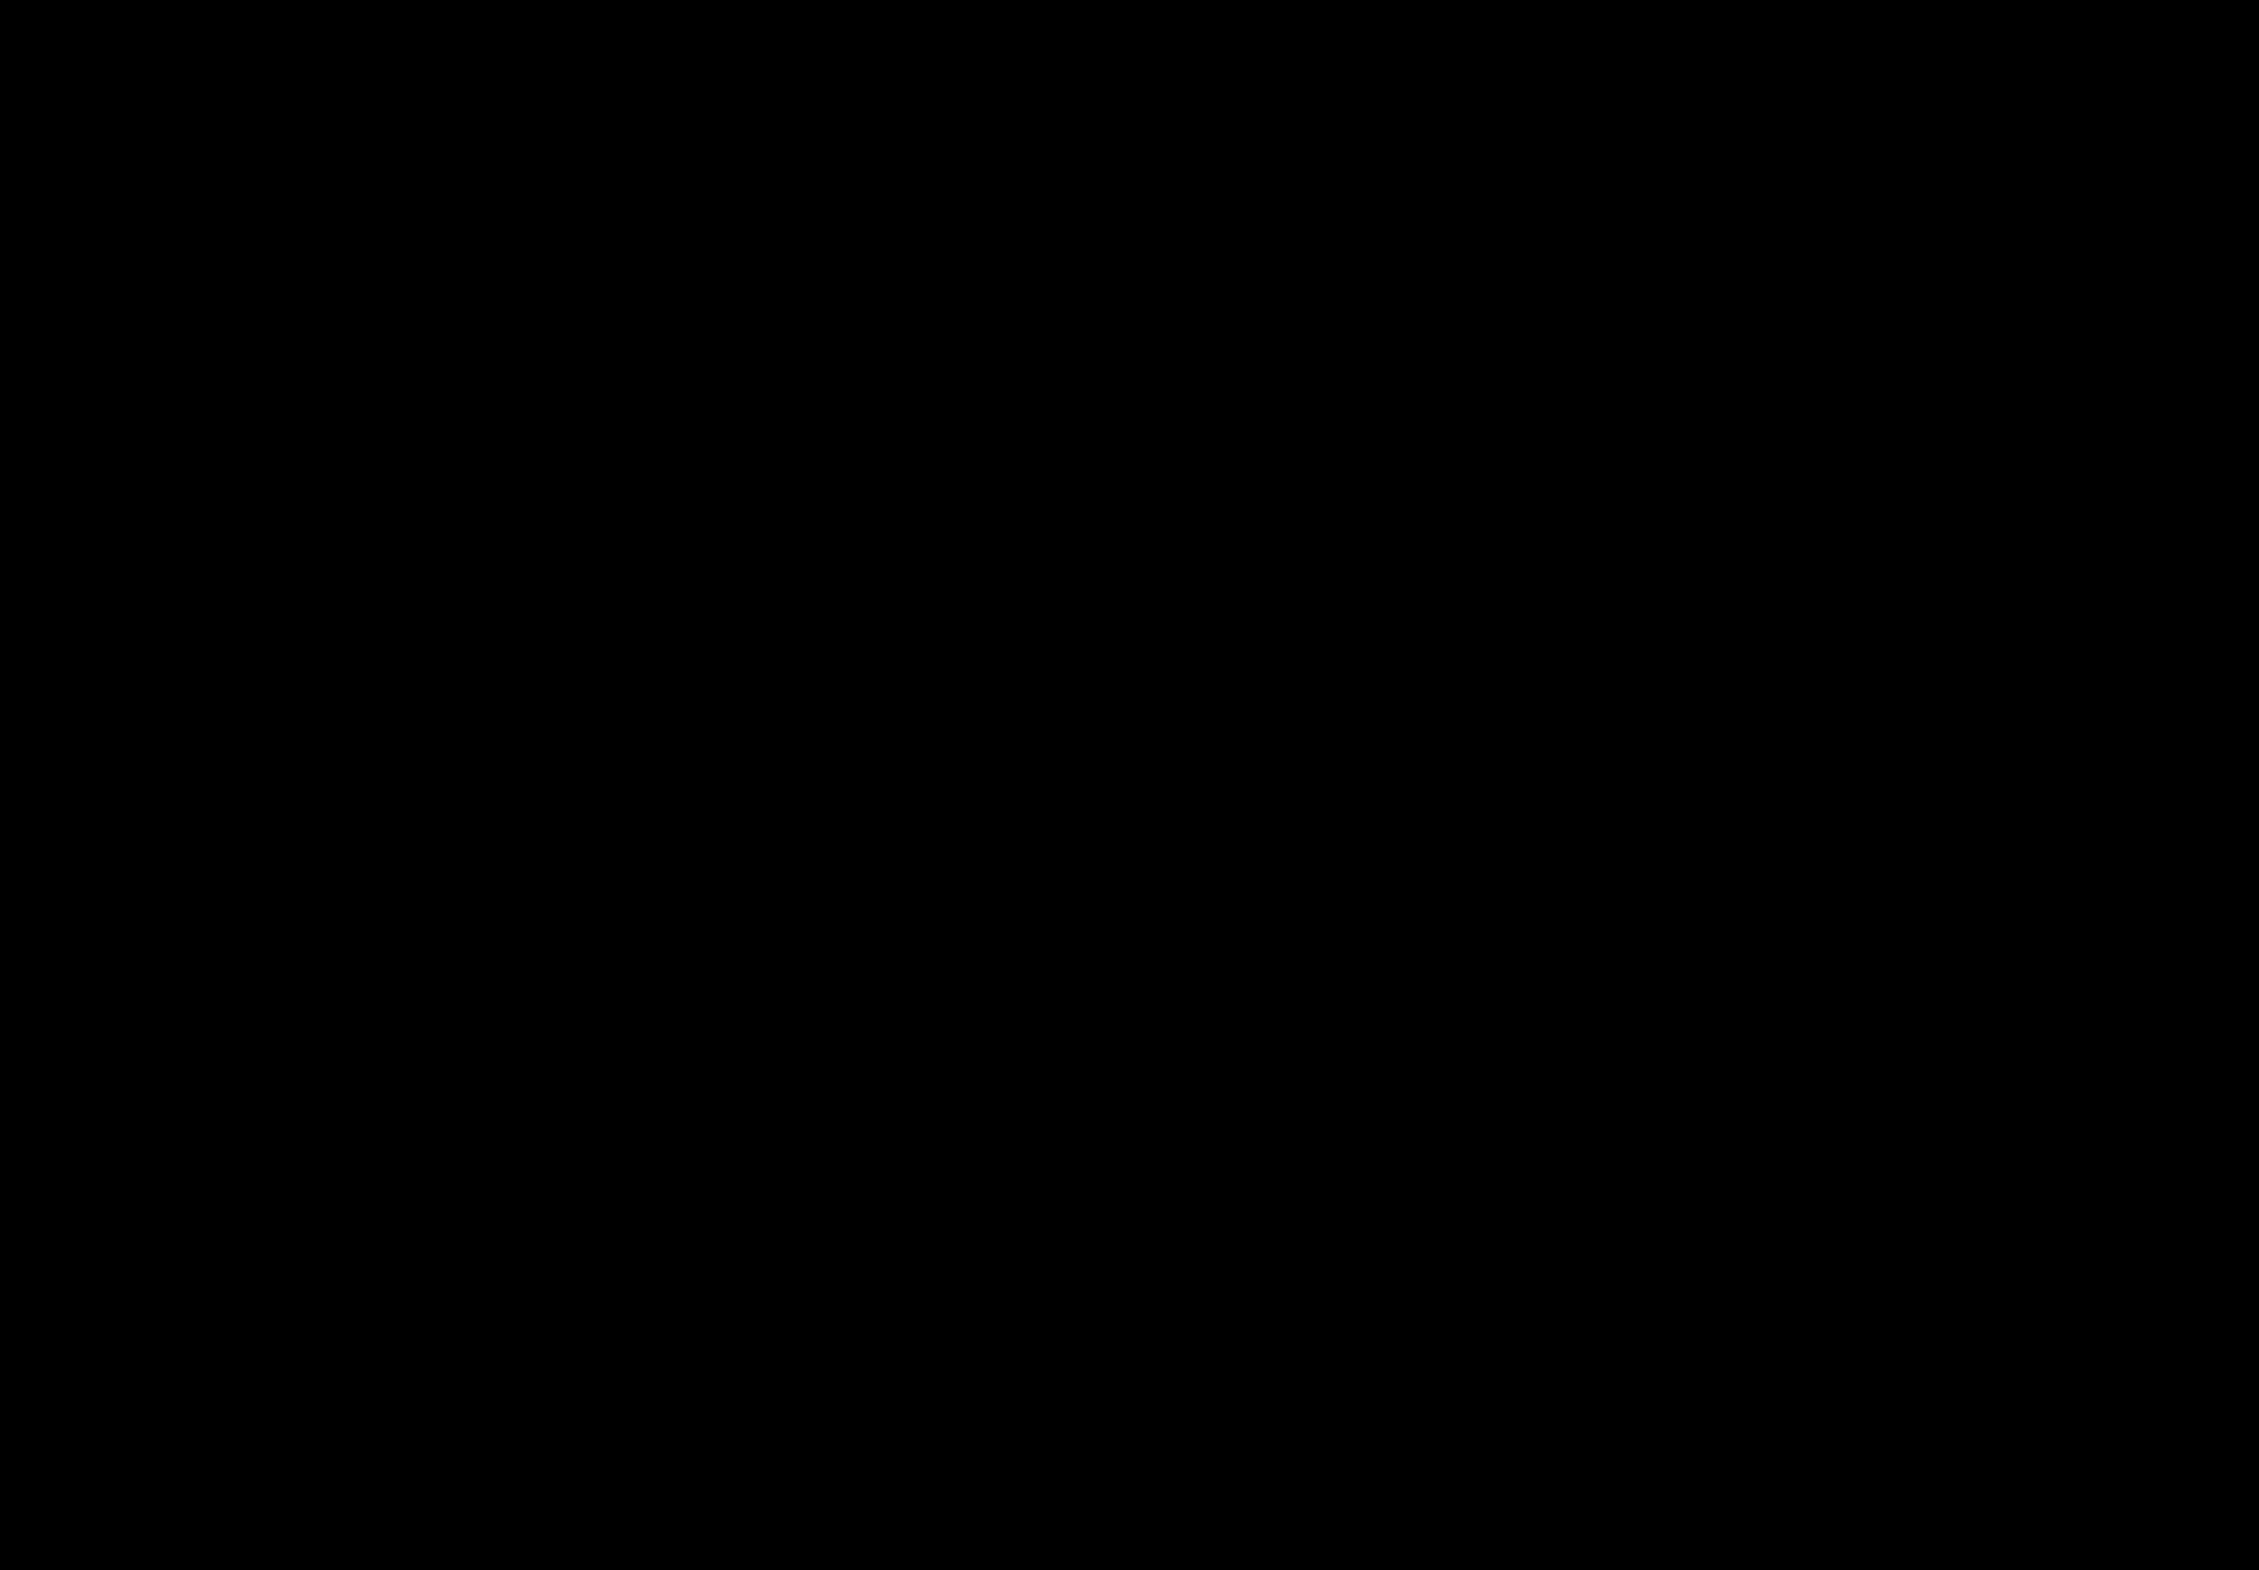 ussi_logo_no-shdw_fv-1